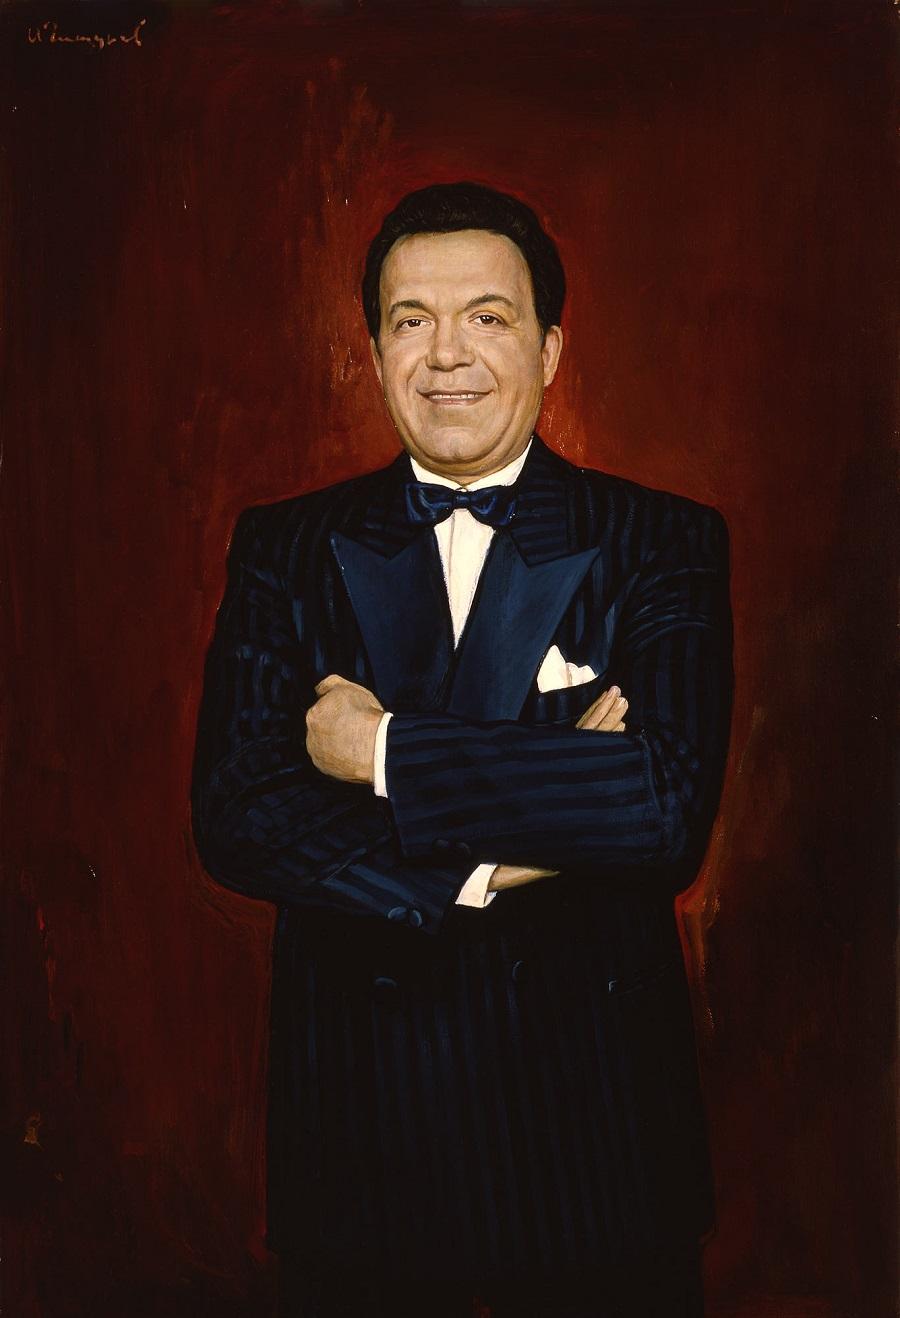 Портрет Иосифа Кобзона   1990 год.